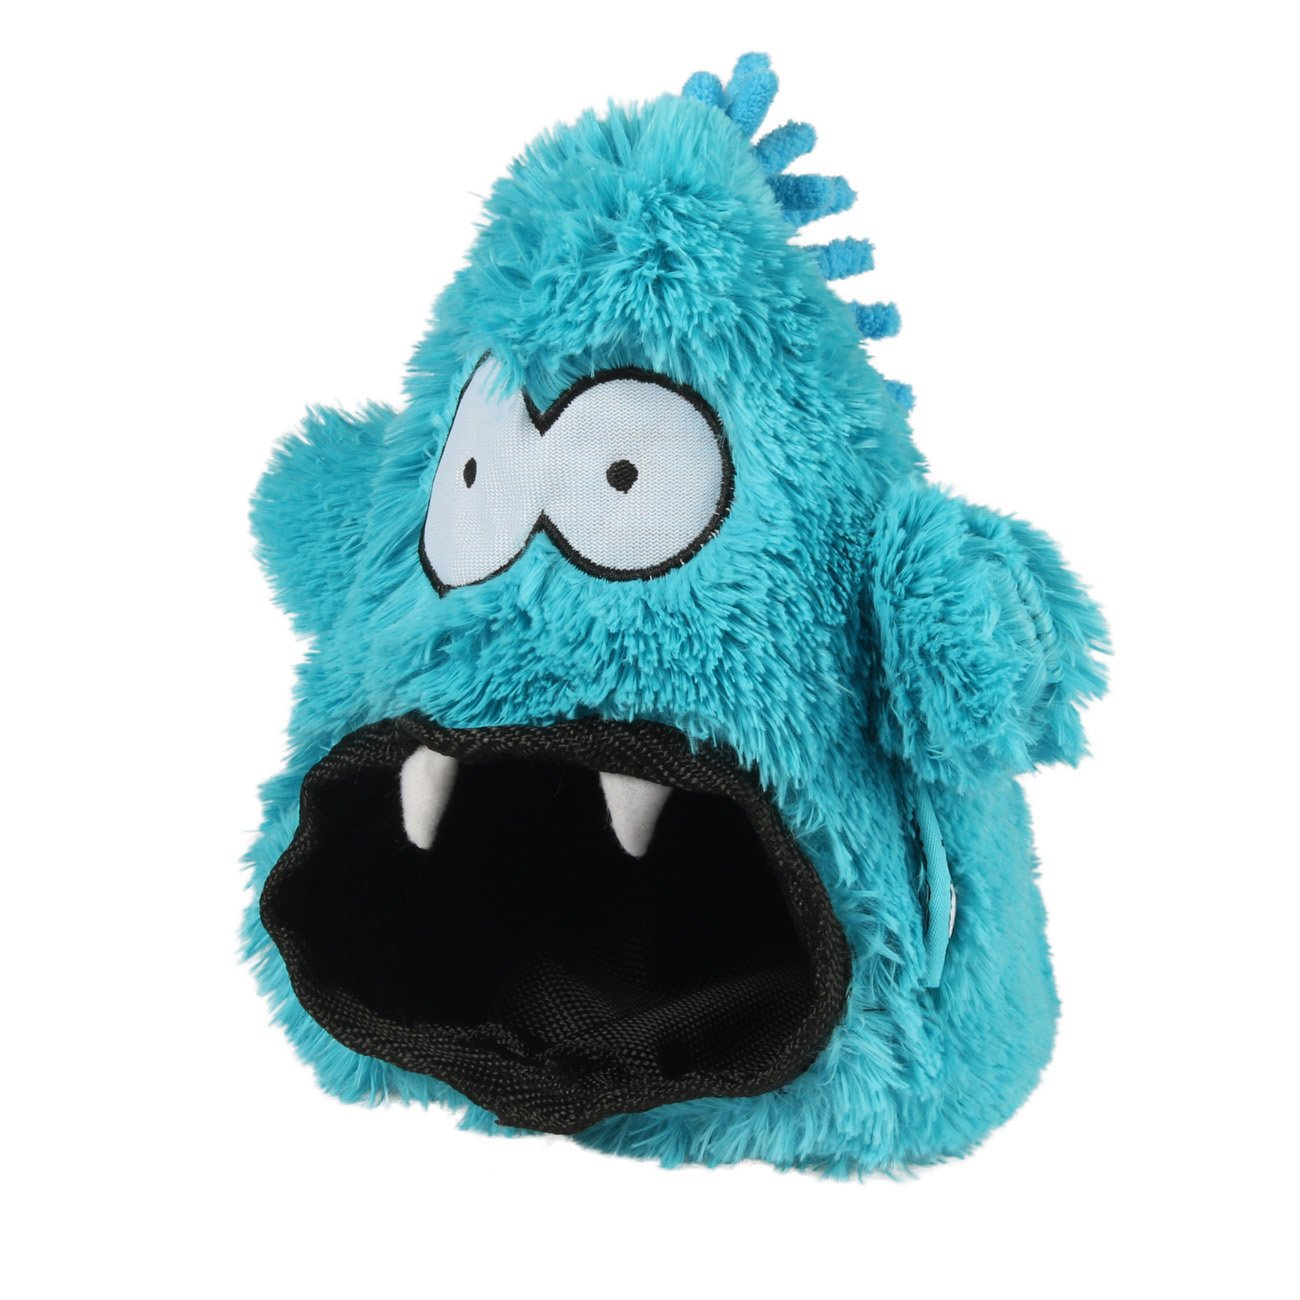 Coockoo Plüsch Monster Hundespielzeug, Bild 6